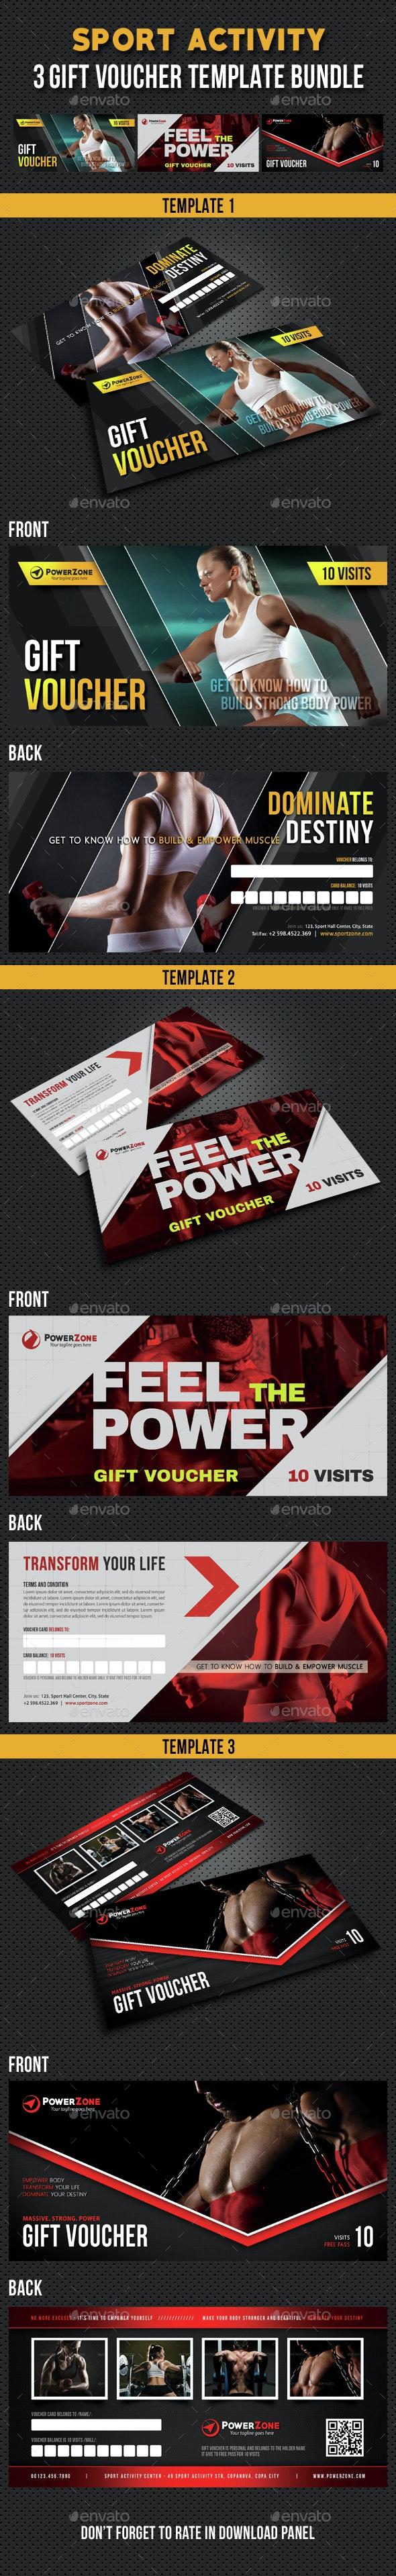 3 in 1 Sport Activity Gift Voucher Bundle 04 - Cards & Invites Print Templates